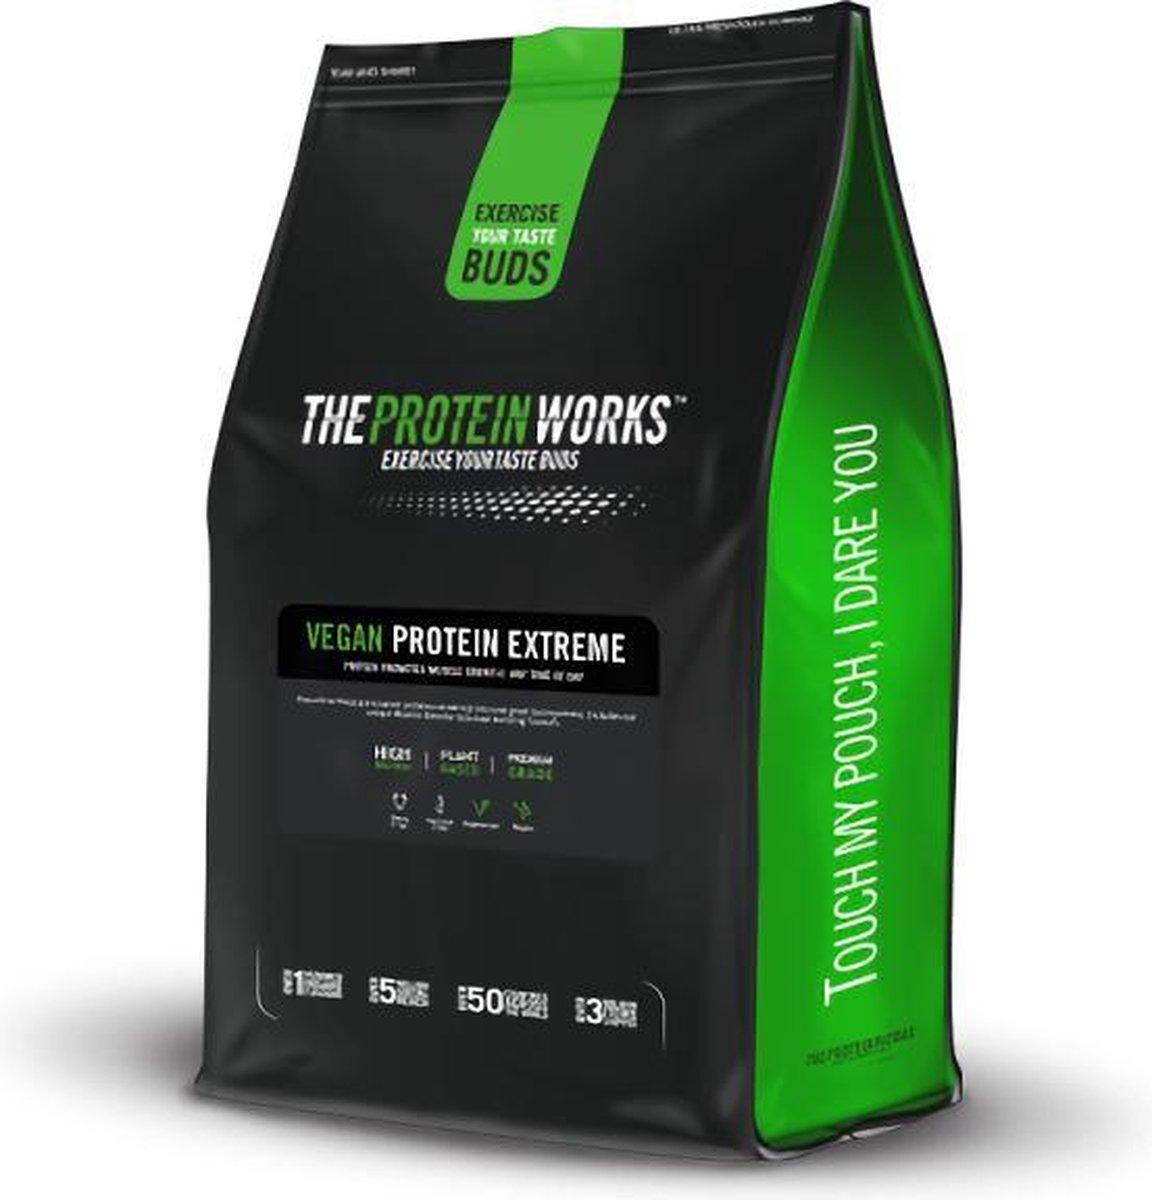 Vegan Protein / Vegan Proteïne - Vegan Proteïne Extreme / Vegan Protein Extreme - The Protein Works | Eiwitpoeder / Eiwitshake | 1kg | Salted Caramel Bandit